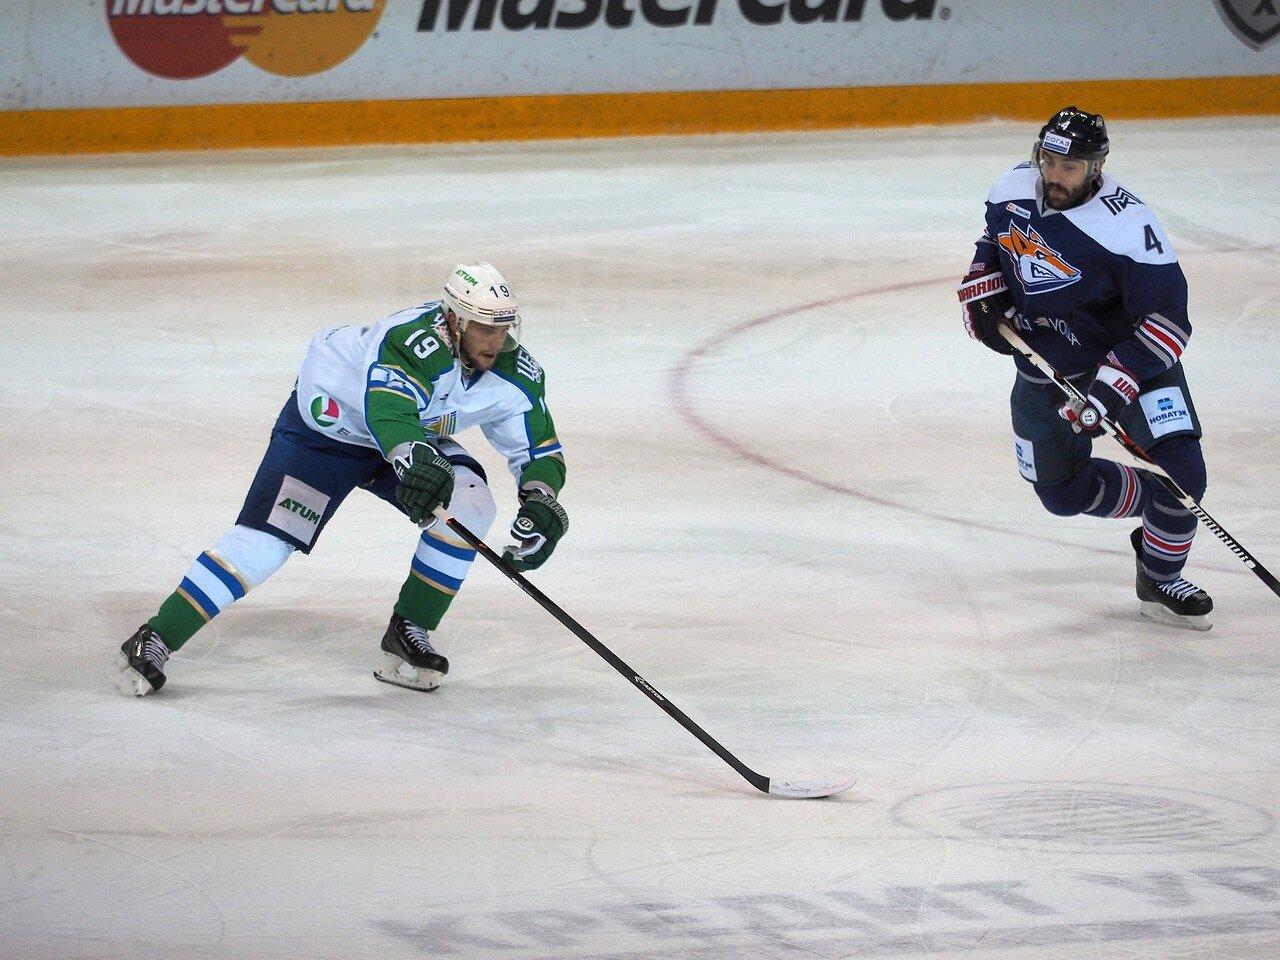 82Плей-офф 2016 Восток Финал Металлург - Салават Юлаев 23.03.2016